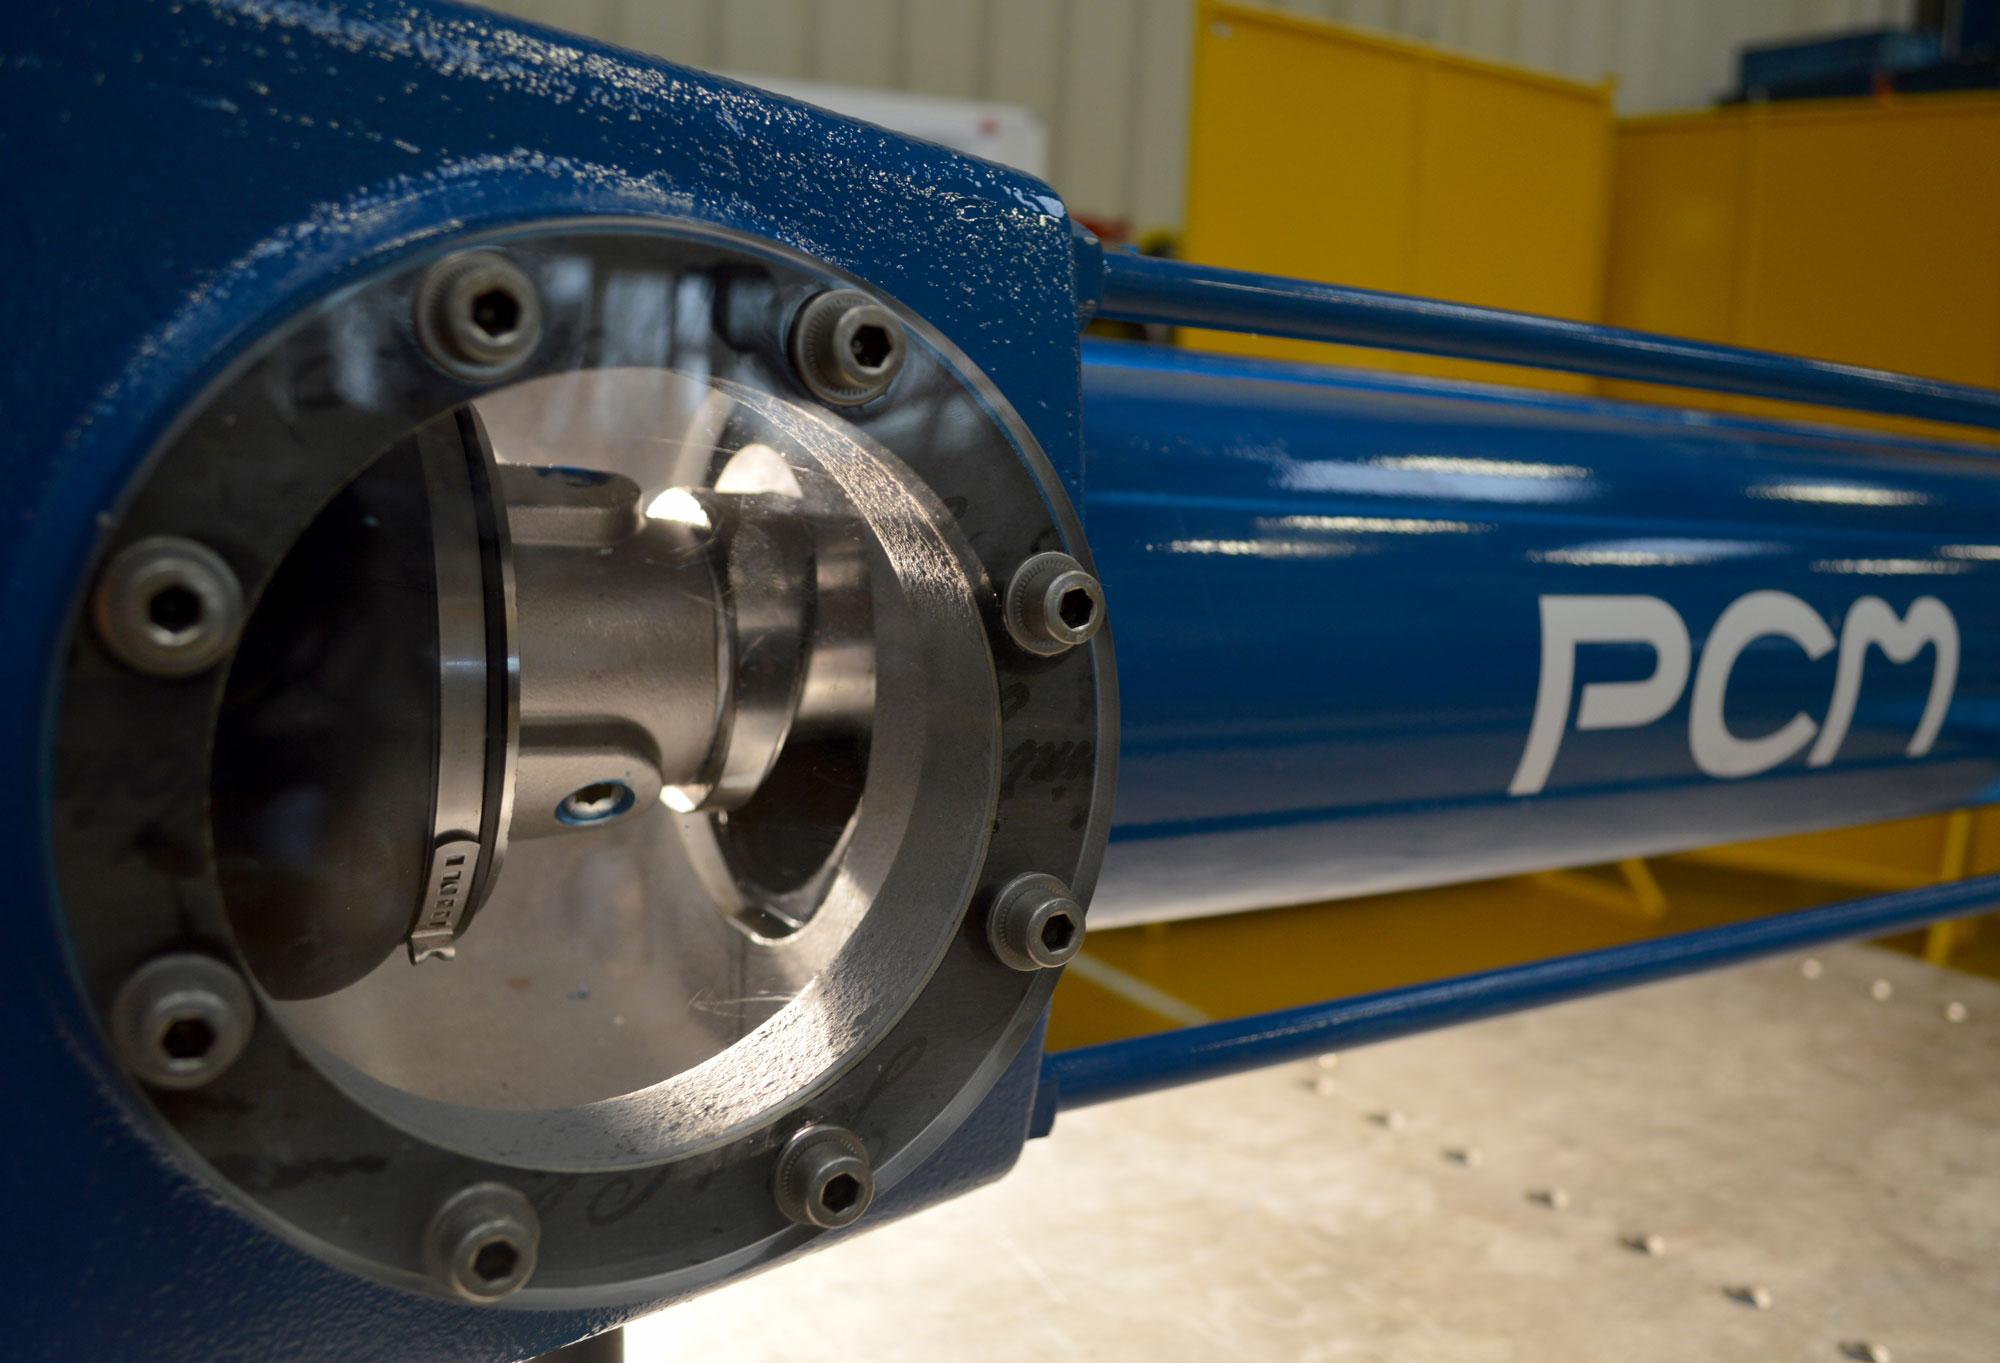 PCM Ecomoineau™ M型螺杆泵是当今市场上最小巧的螺杆泵  - 180M6L model